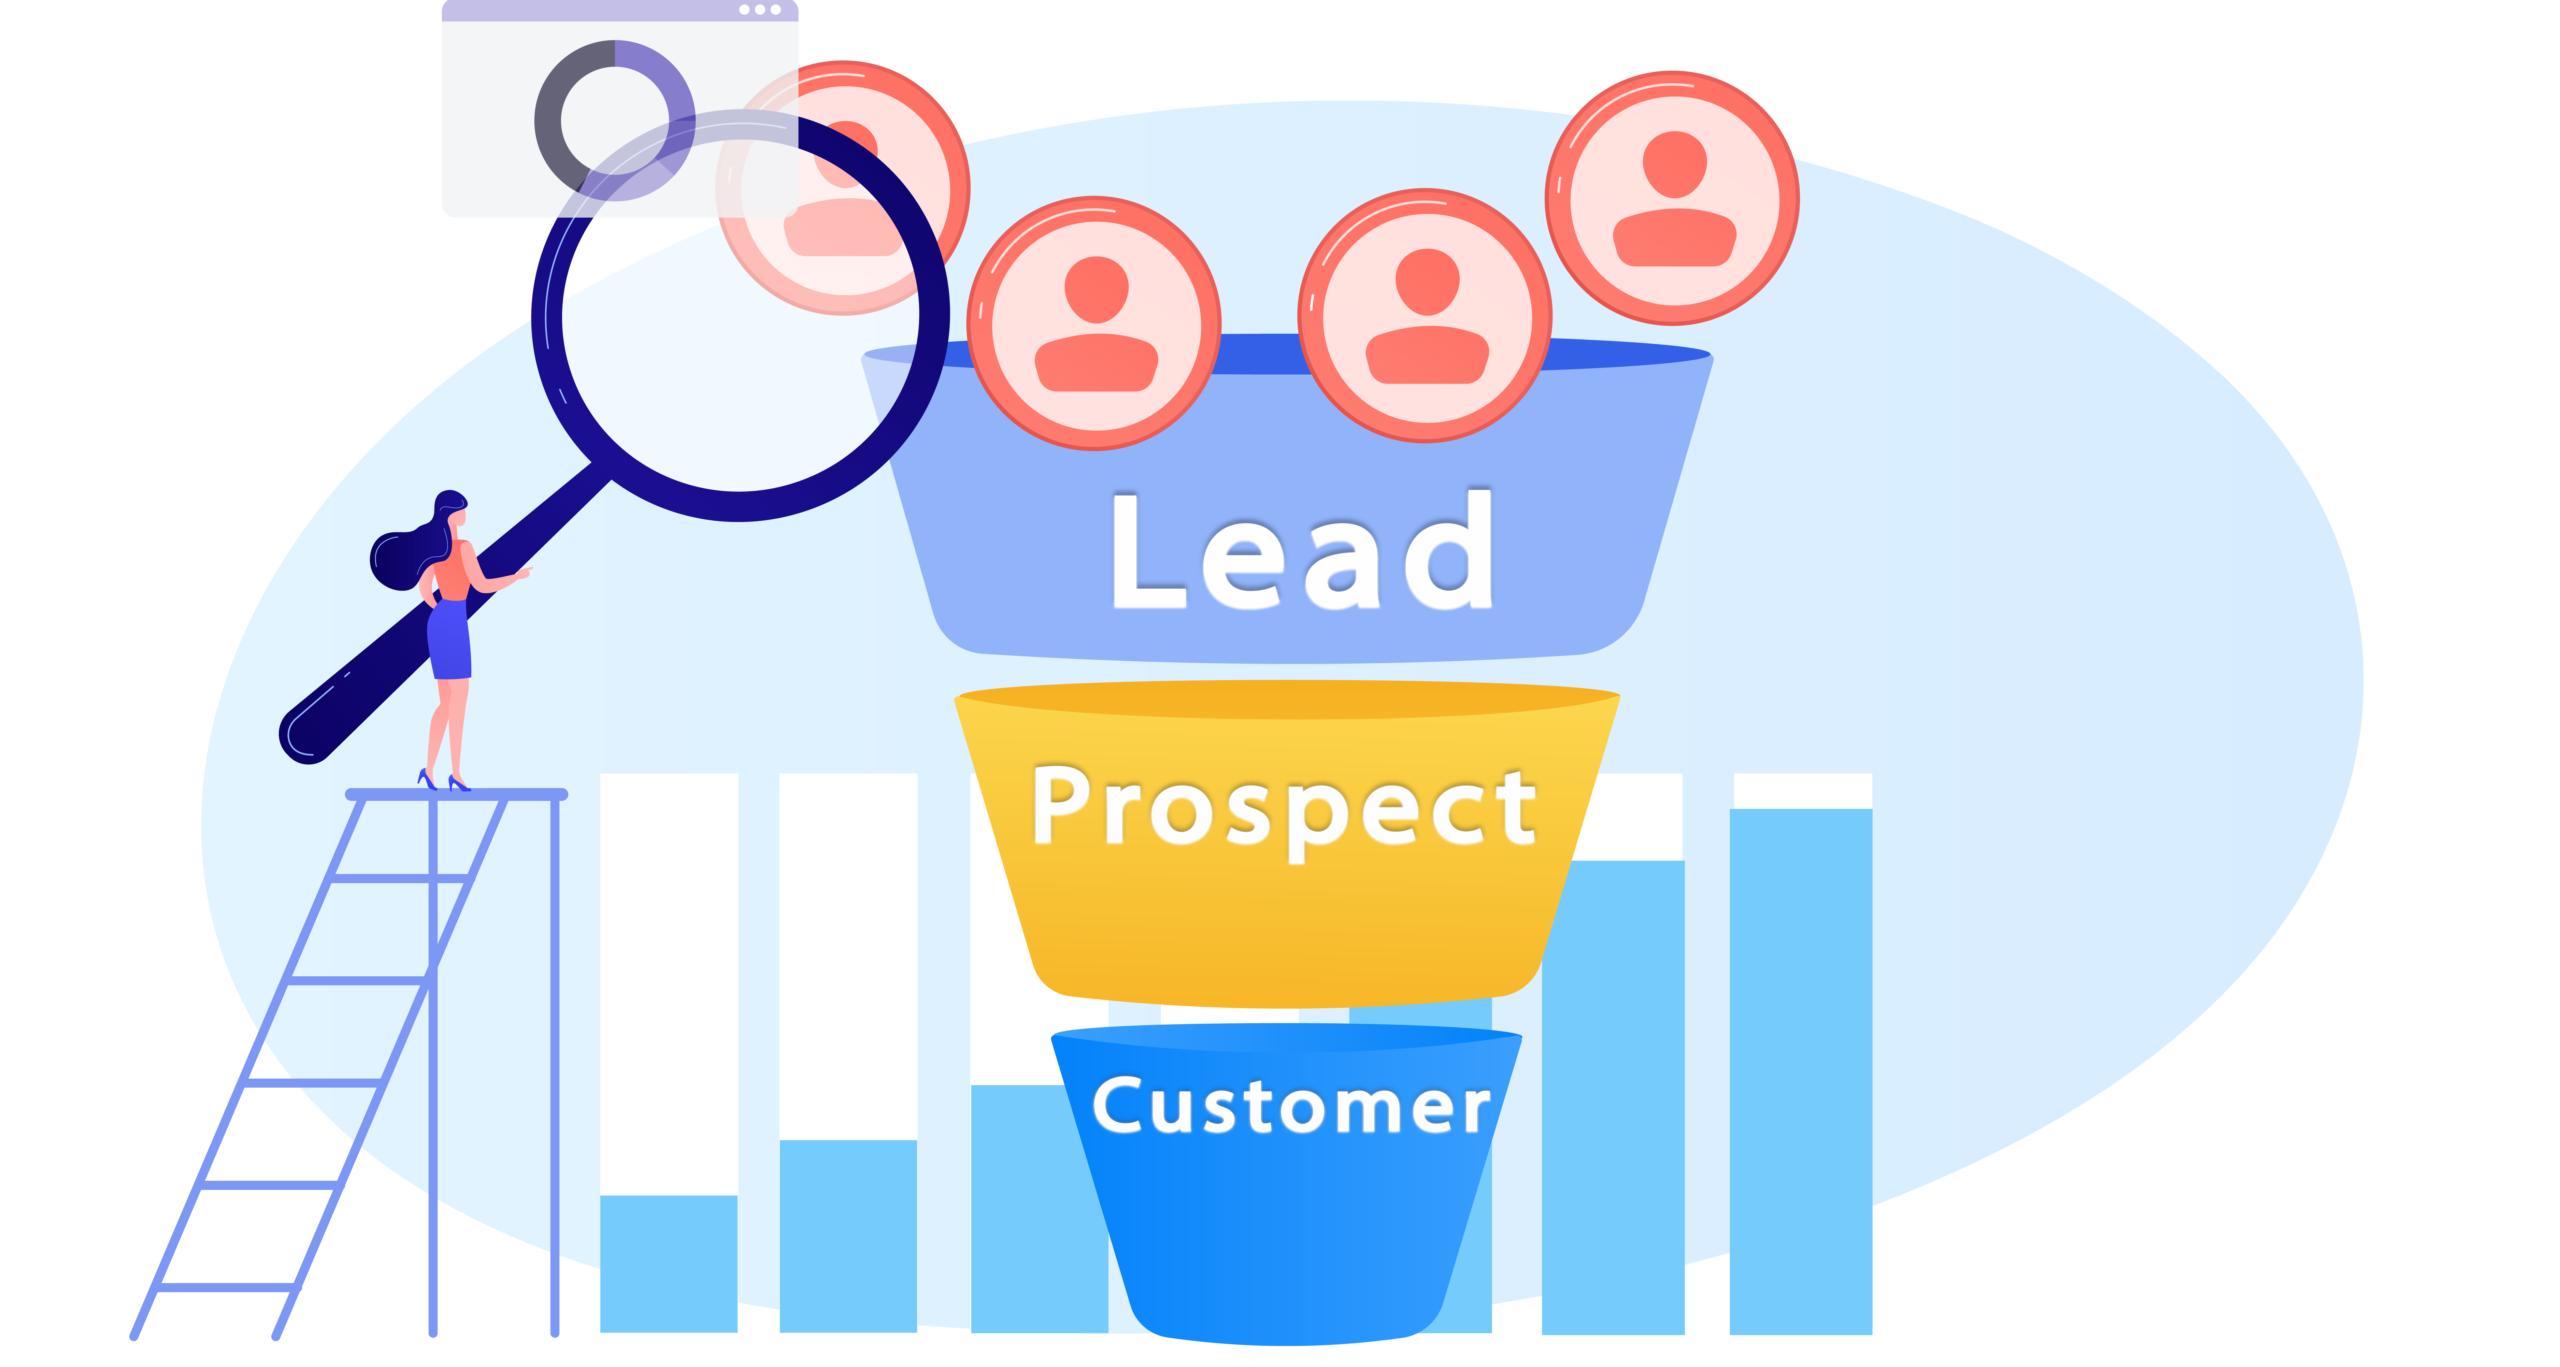 crm sales funnel lead prospect customer